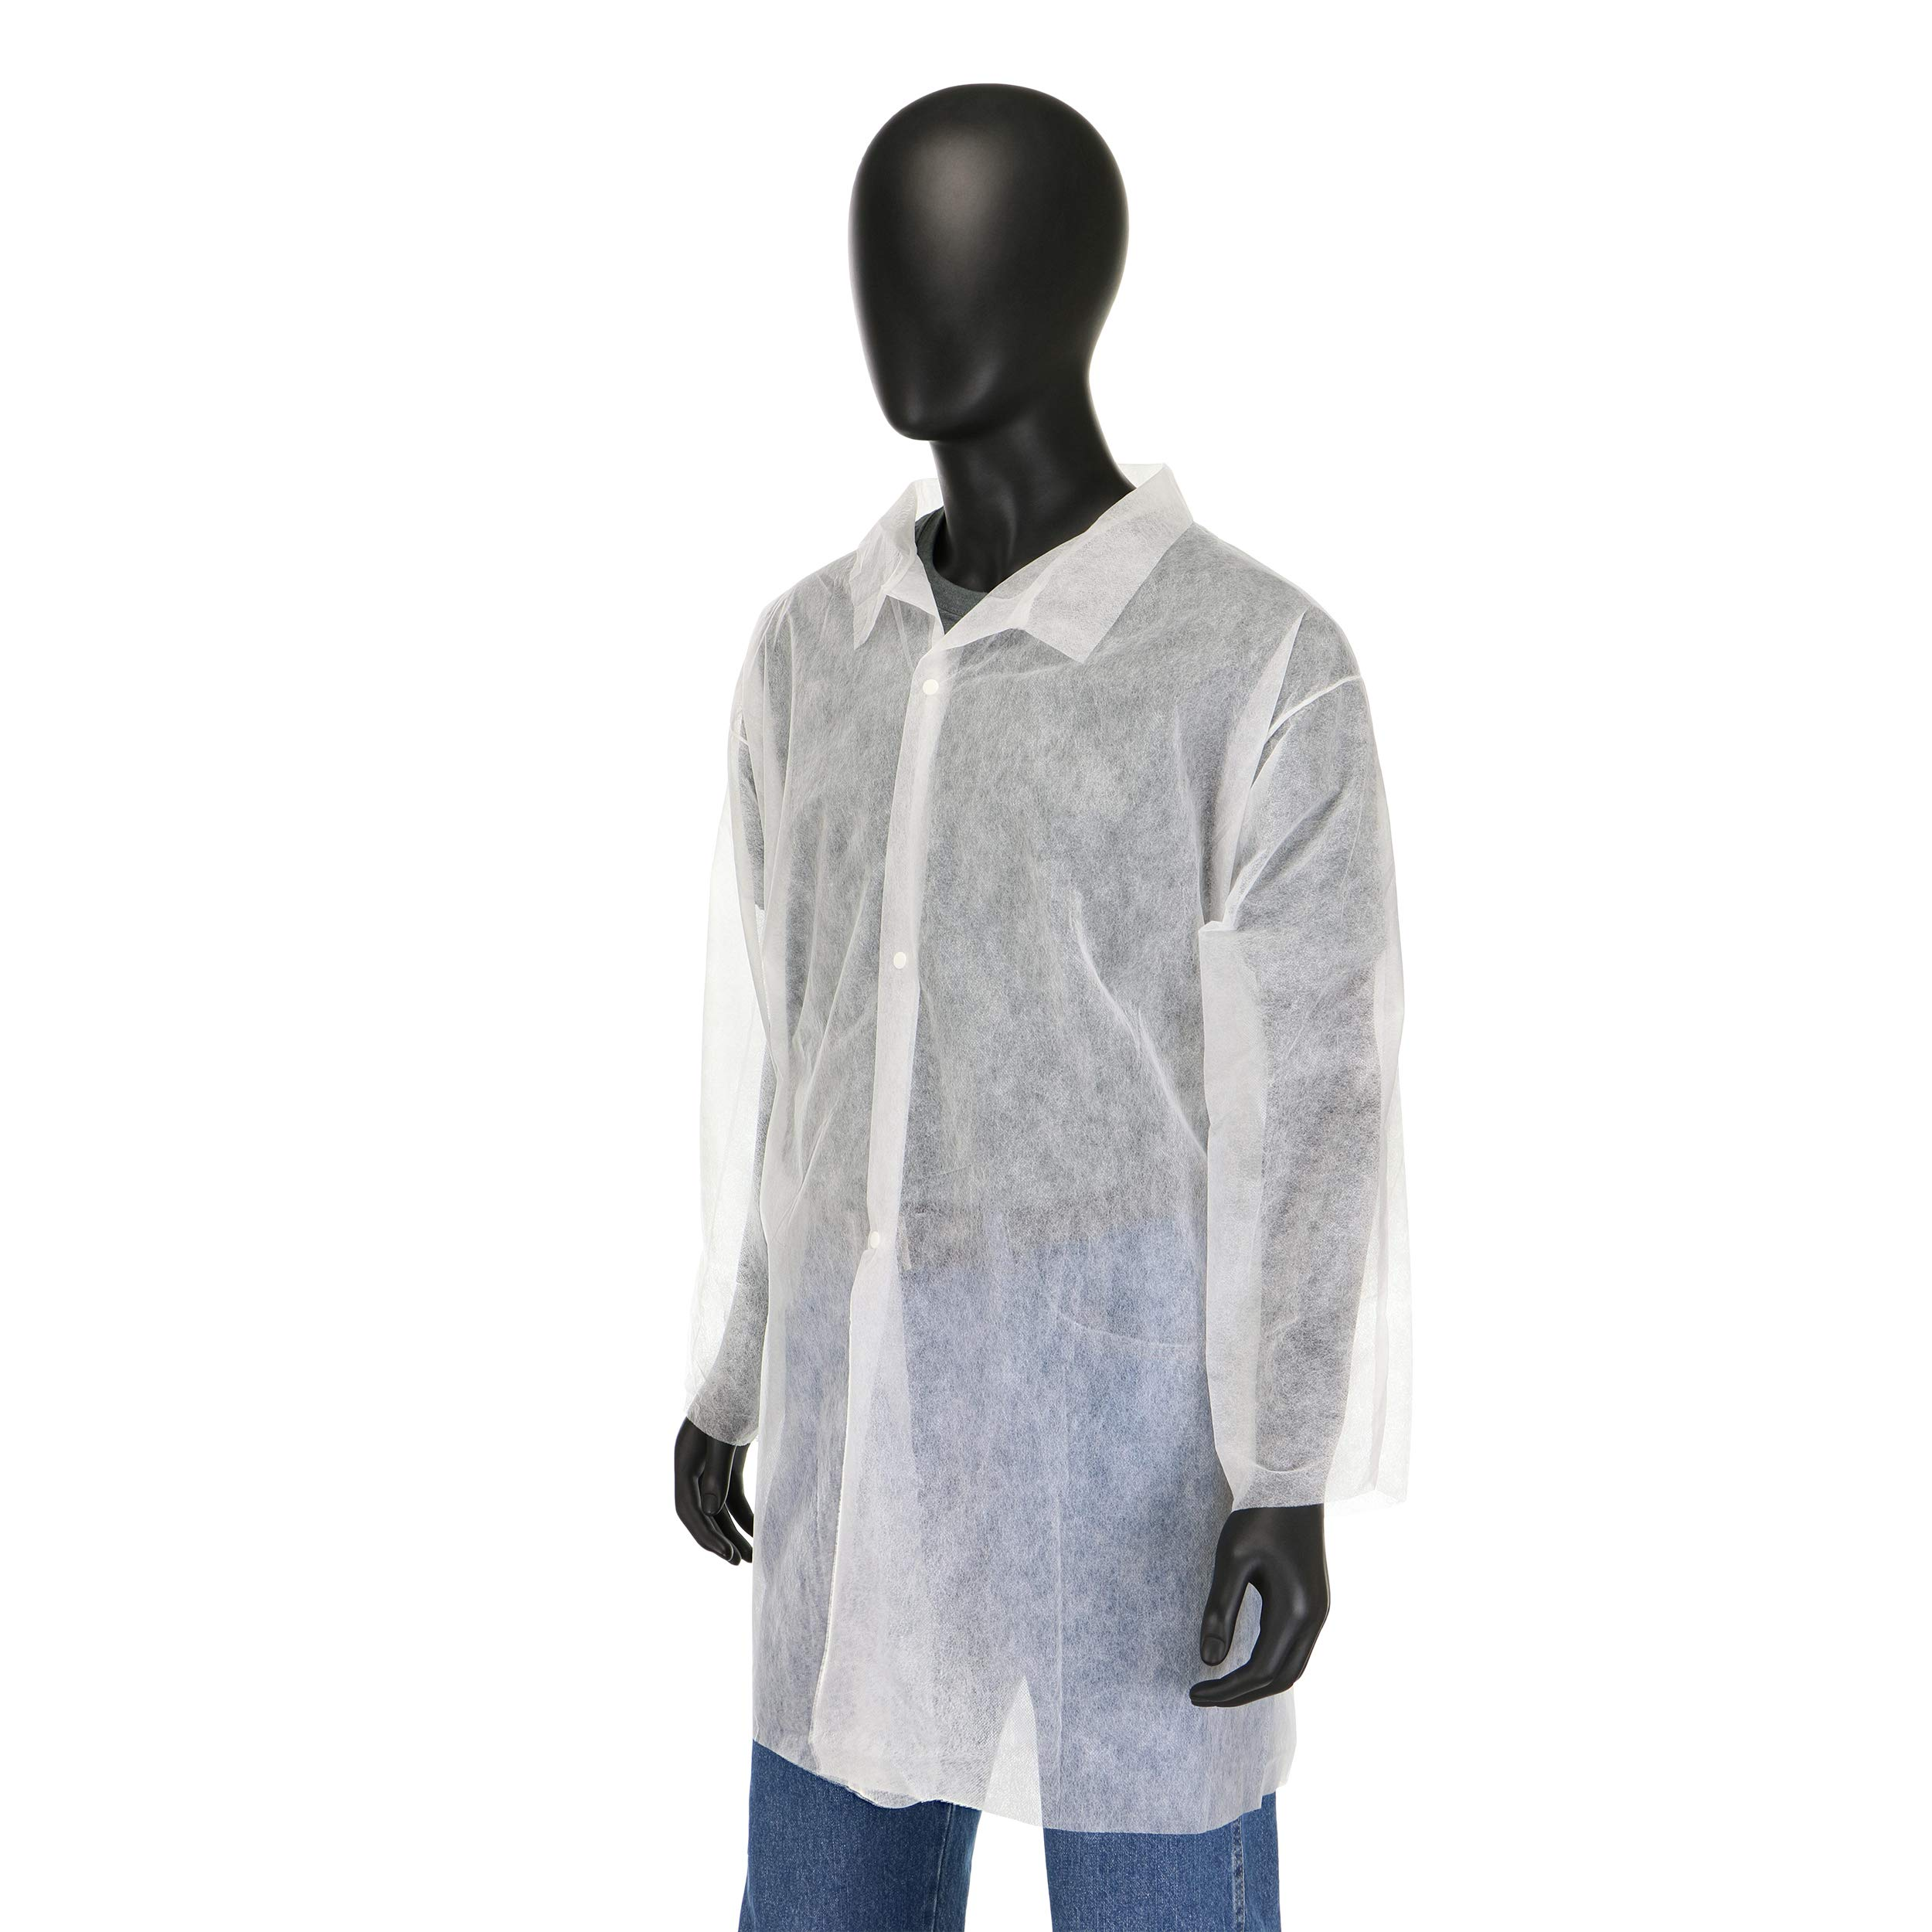 West Chester 3511 XX2XL Polypropylene STD WGT SBP Lab Coat, No Pocket, 4XL, White (Pack of 30)